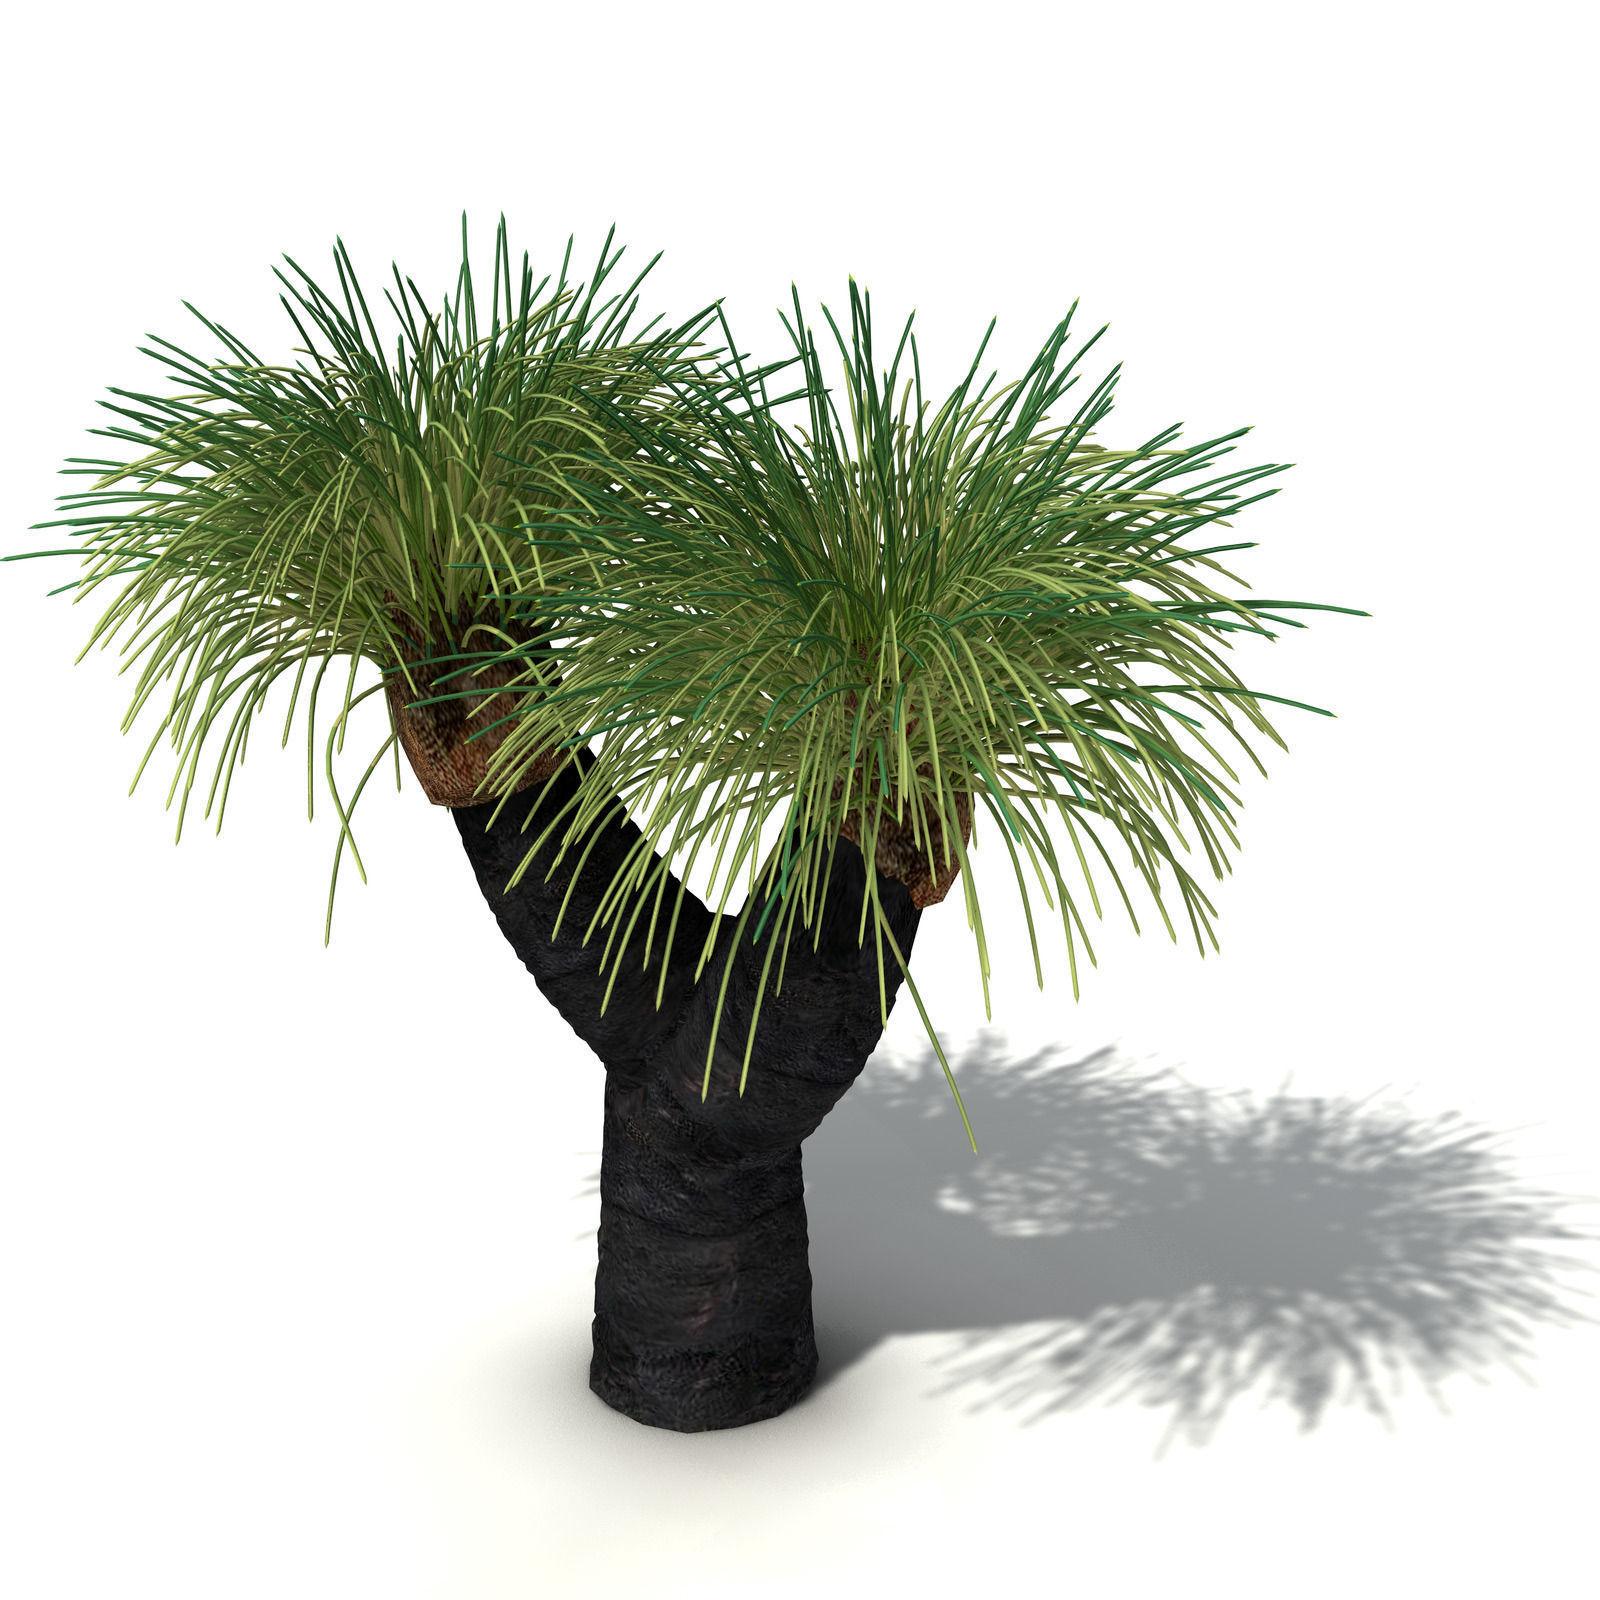 Xfrogplants Australian Grass Tree 3d Model Max Obj 3ds